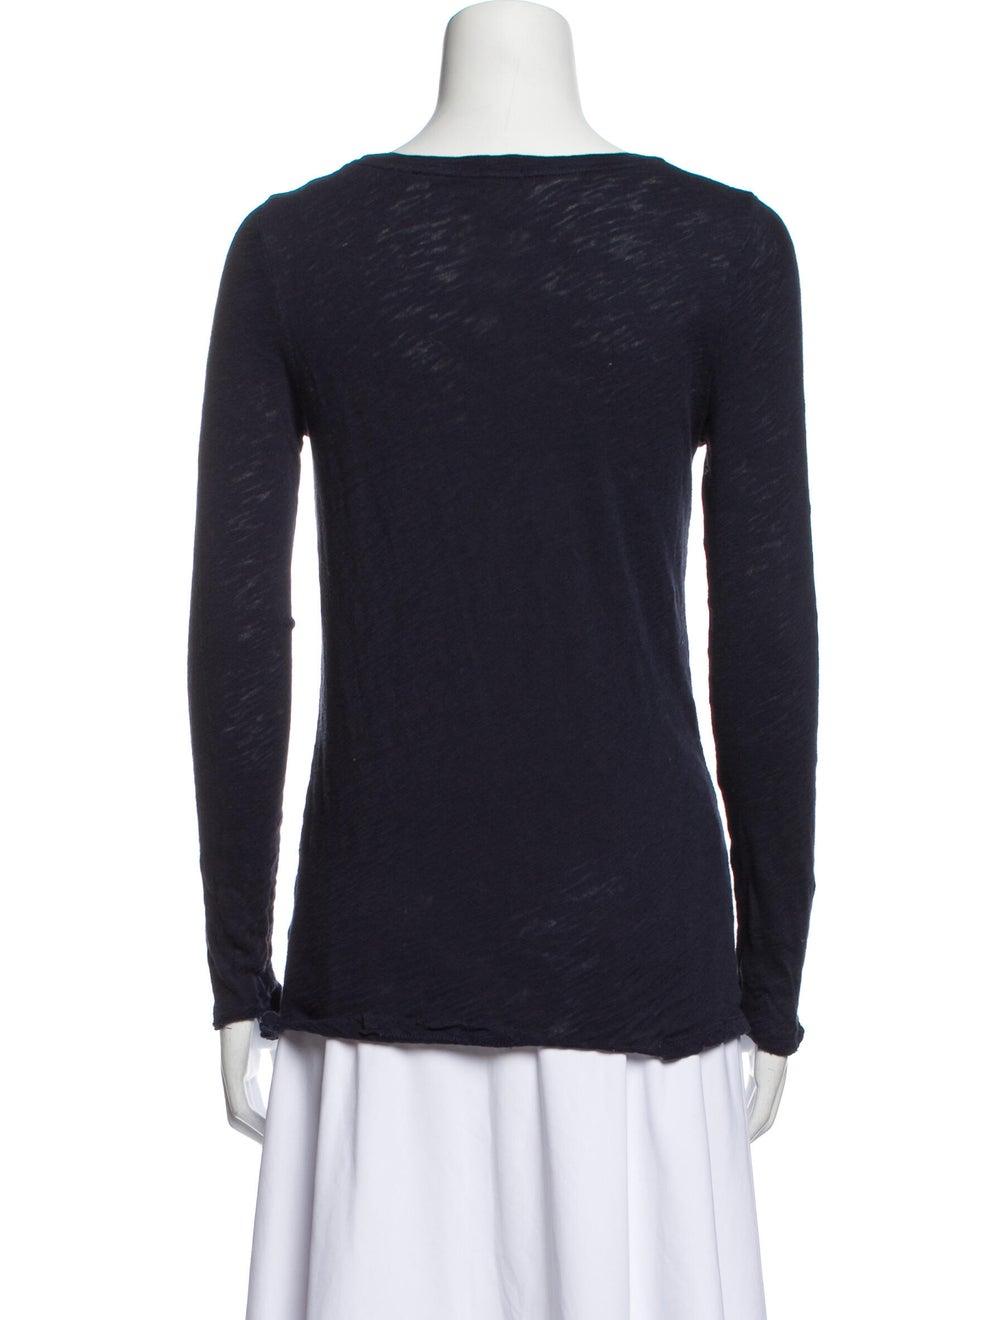 ATM Scoop Neck Long Sleeve T-Shirt Blue - image 3